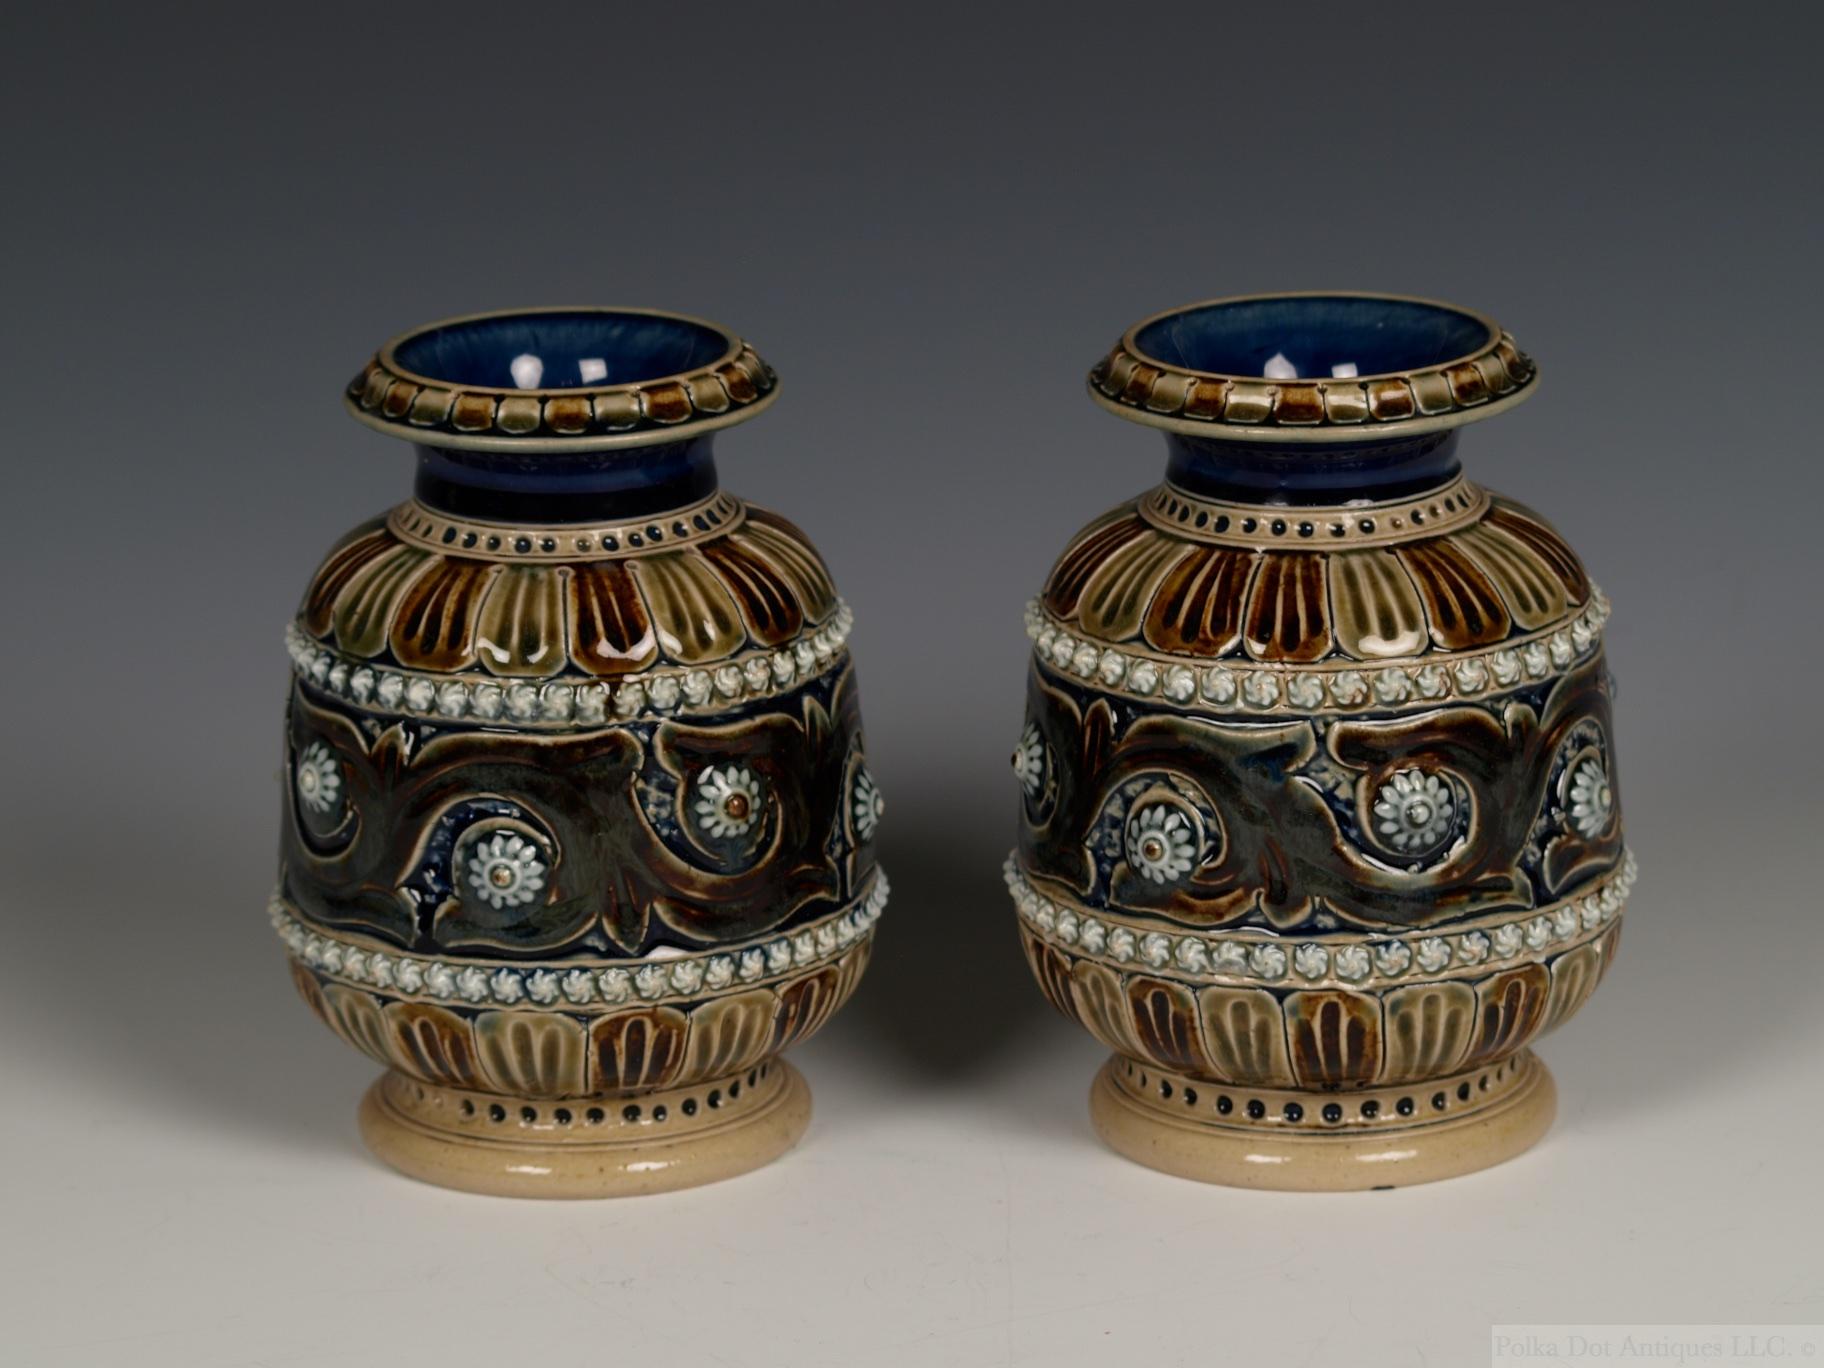 "Pair of Doulton Lambeth Salt-Glazed Stoneware Vases, 1875, by Eliza Simmance, 4¾"" (12.5 cm)."